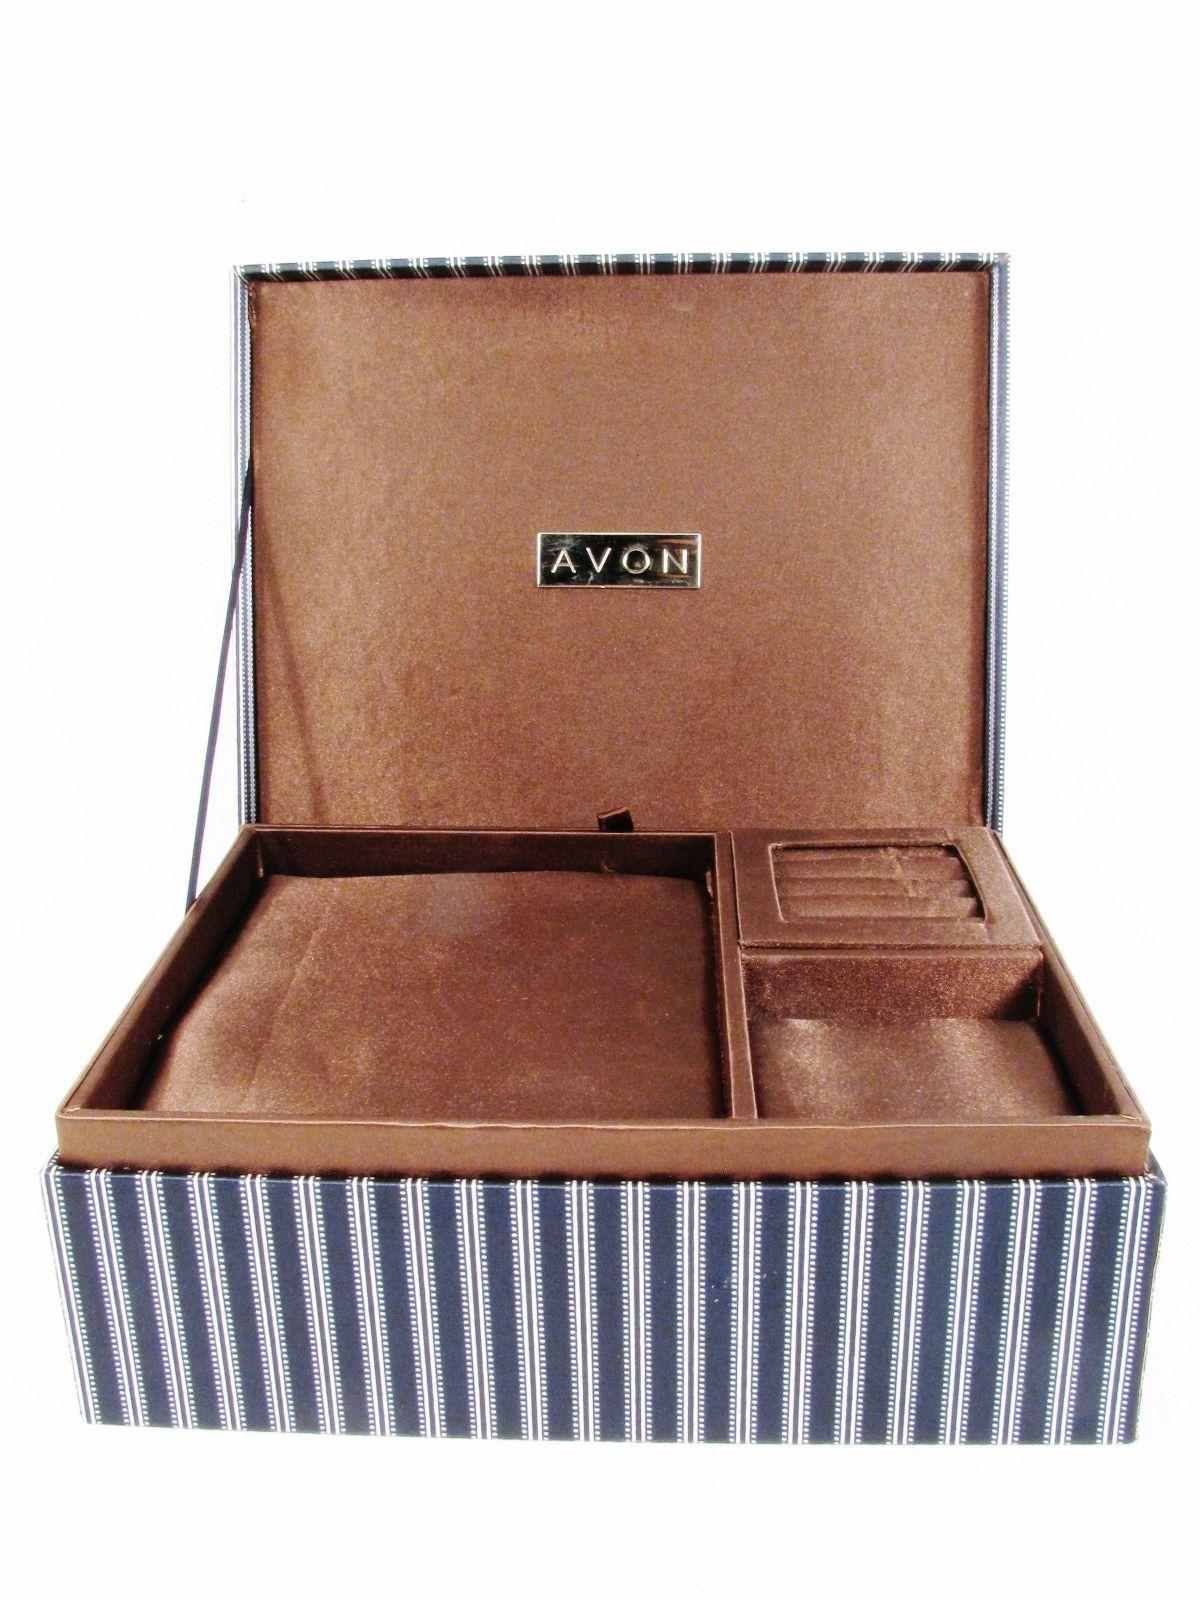 Avon Jewelry Box 5 listings